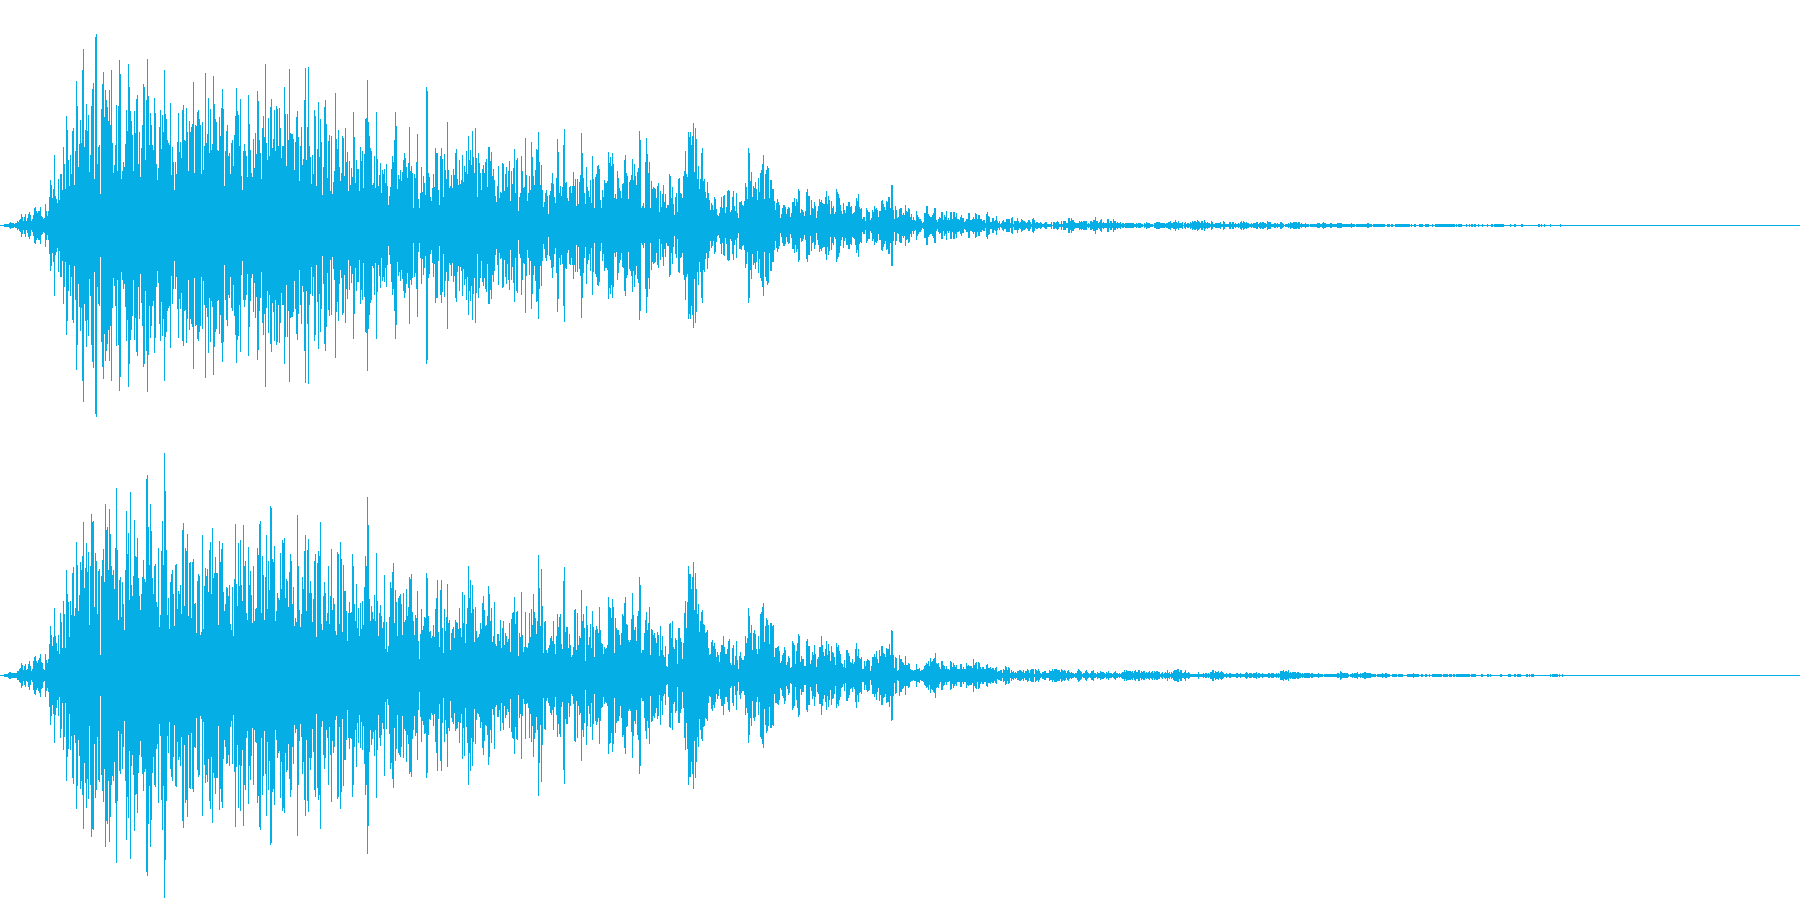 Animal ゾンビのような猛獣の声の再生済みの波形